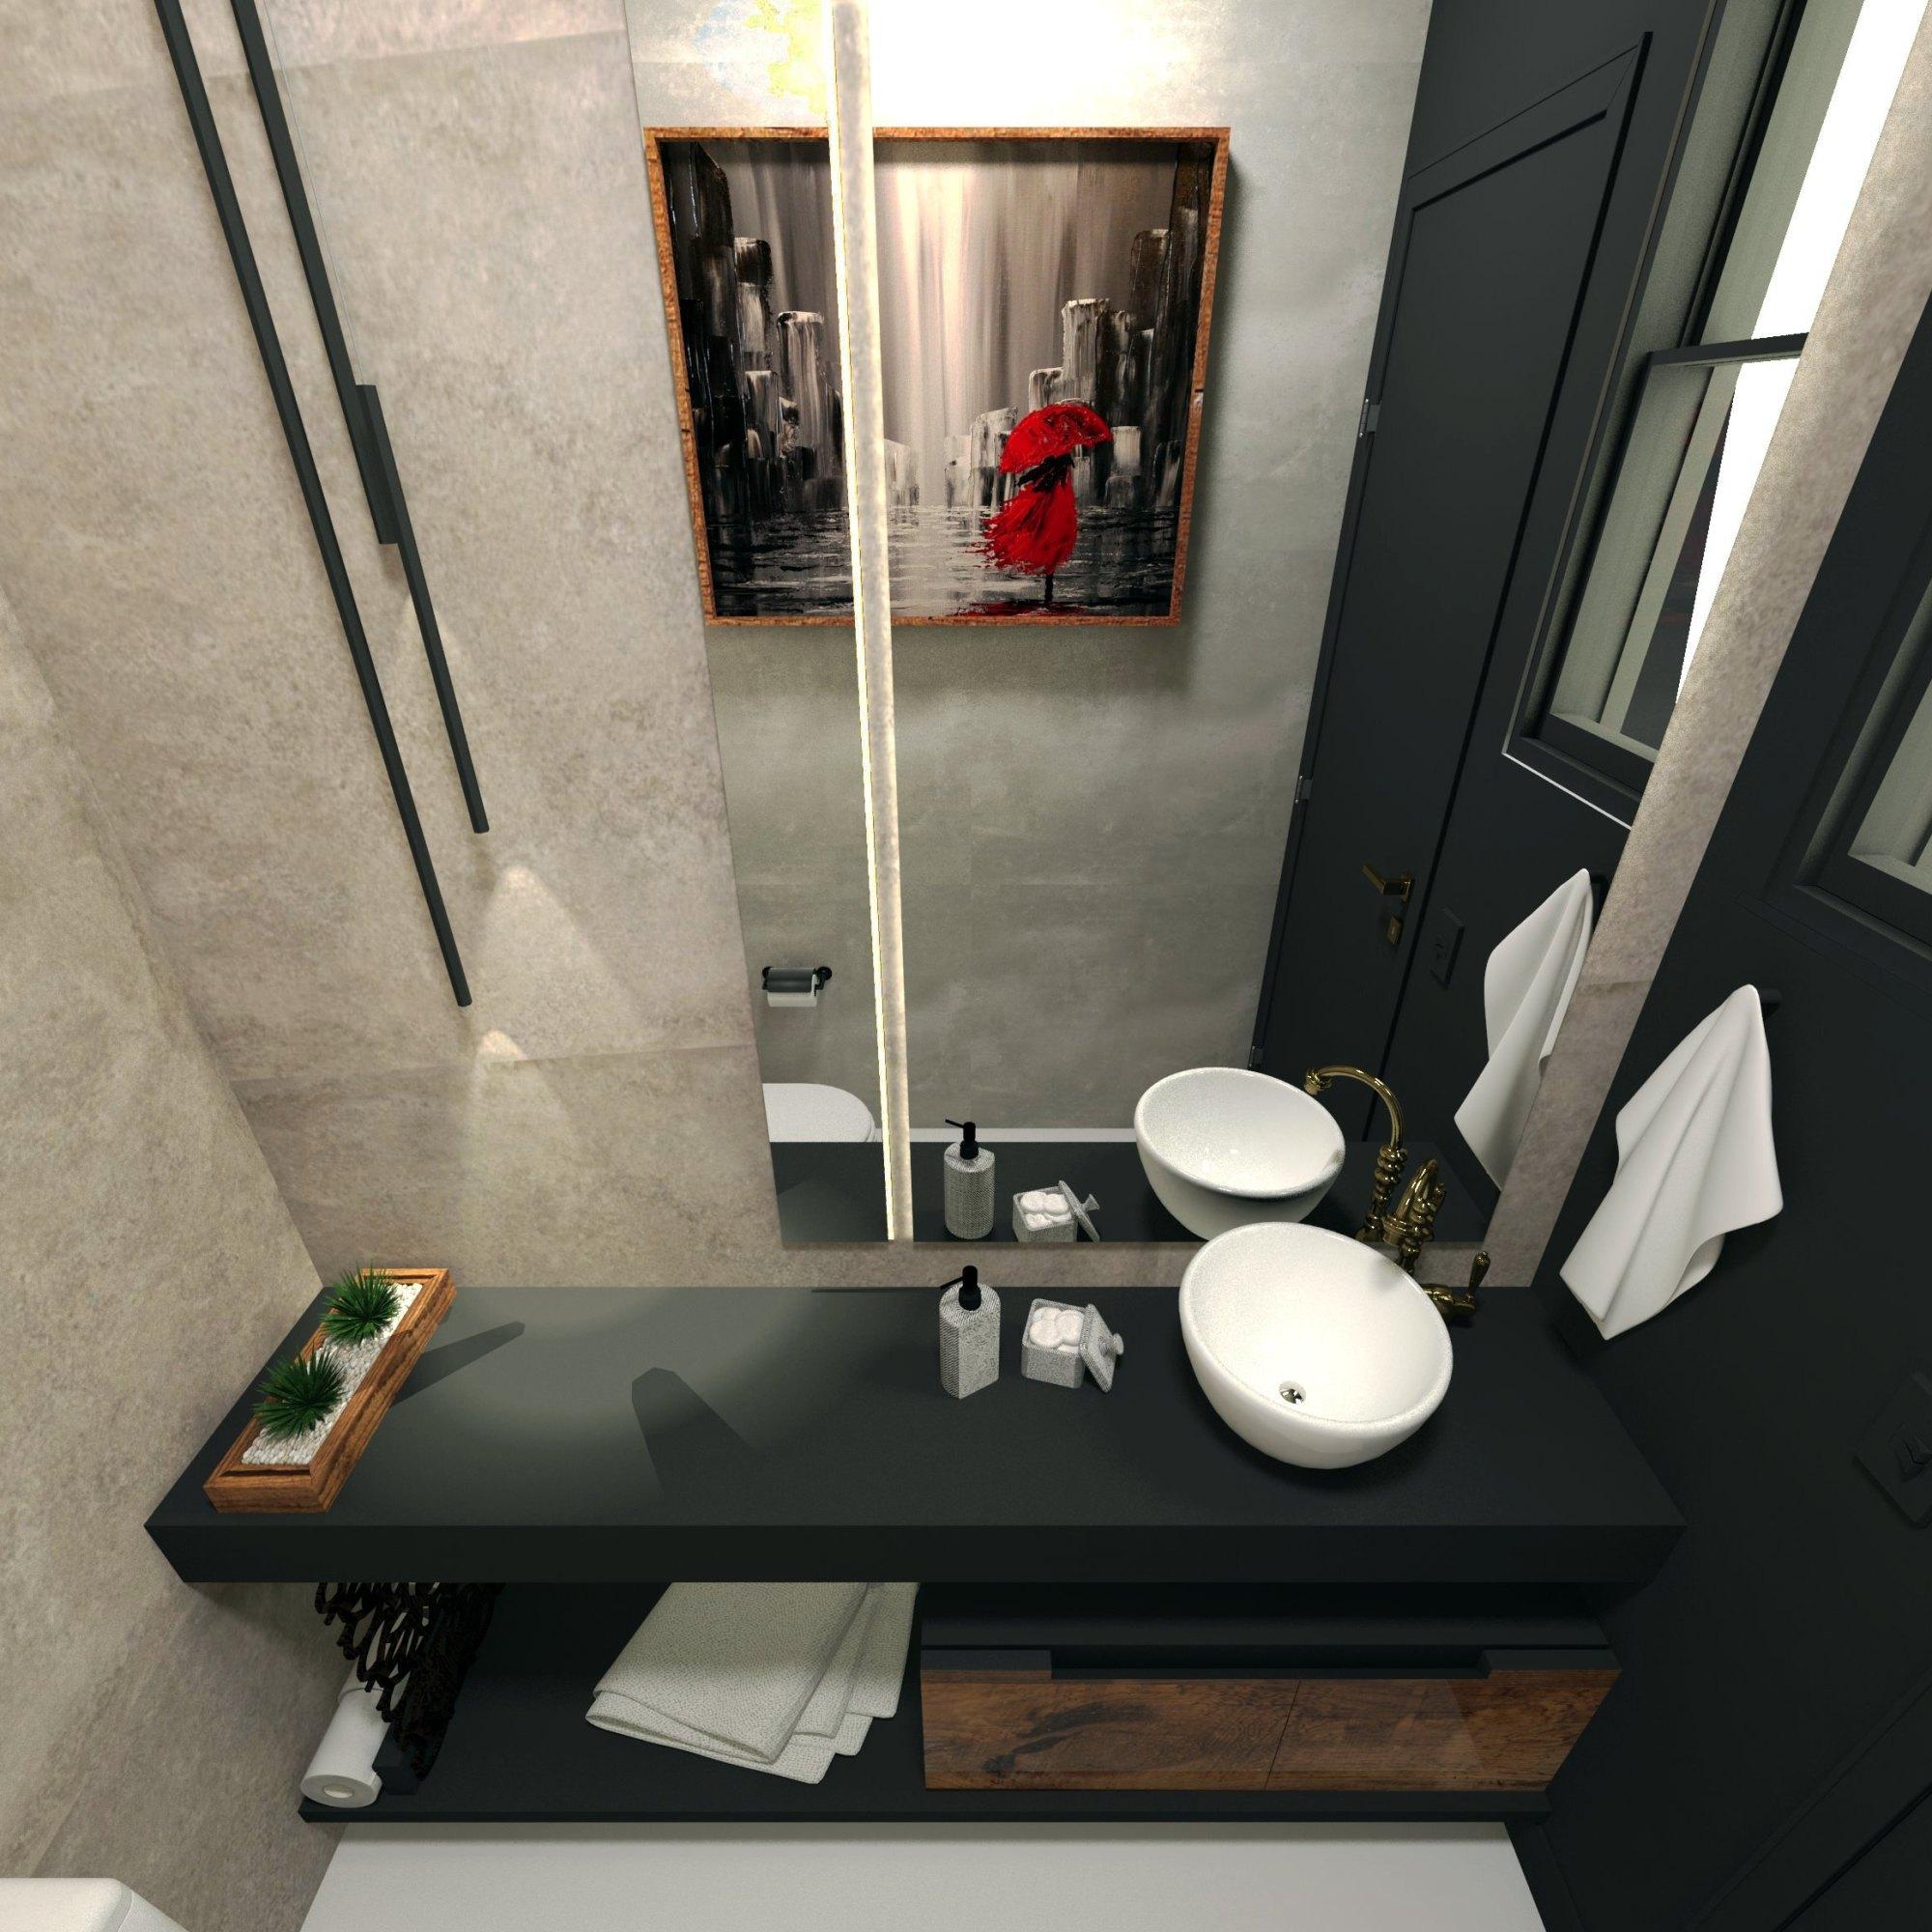 lavabo moderno preto cimento ideias